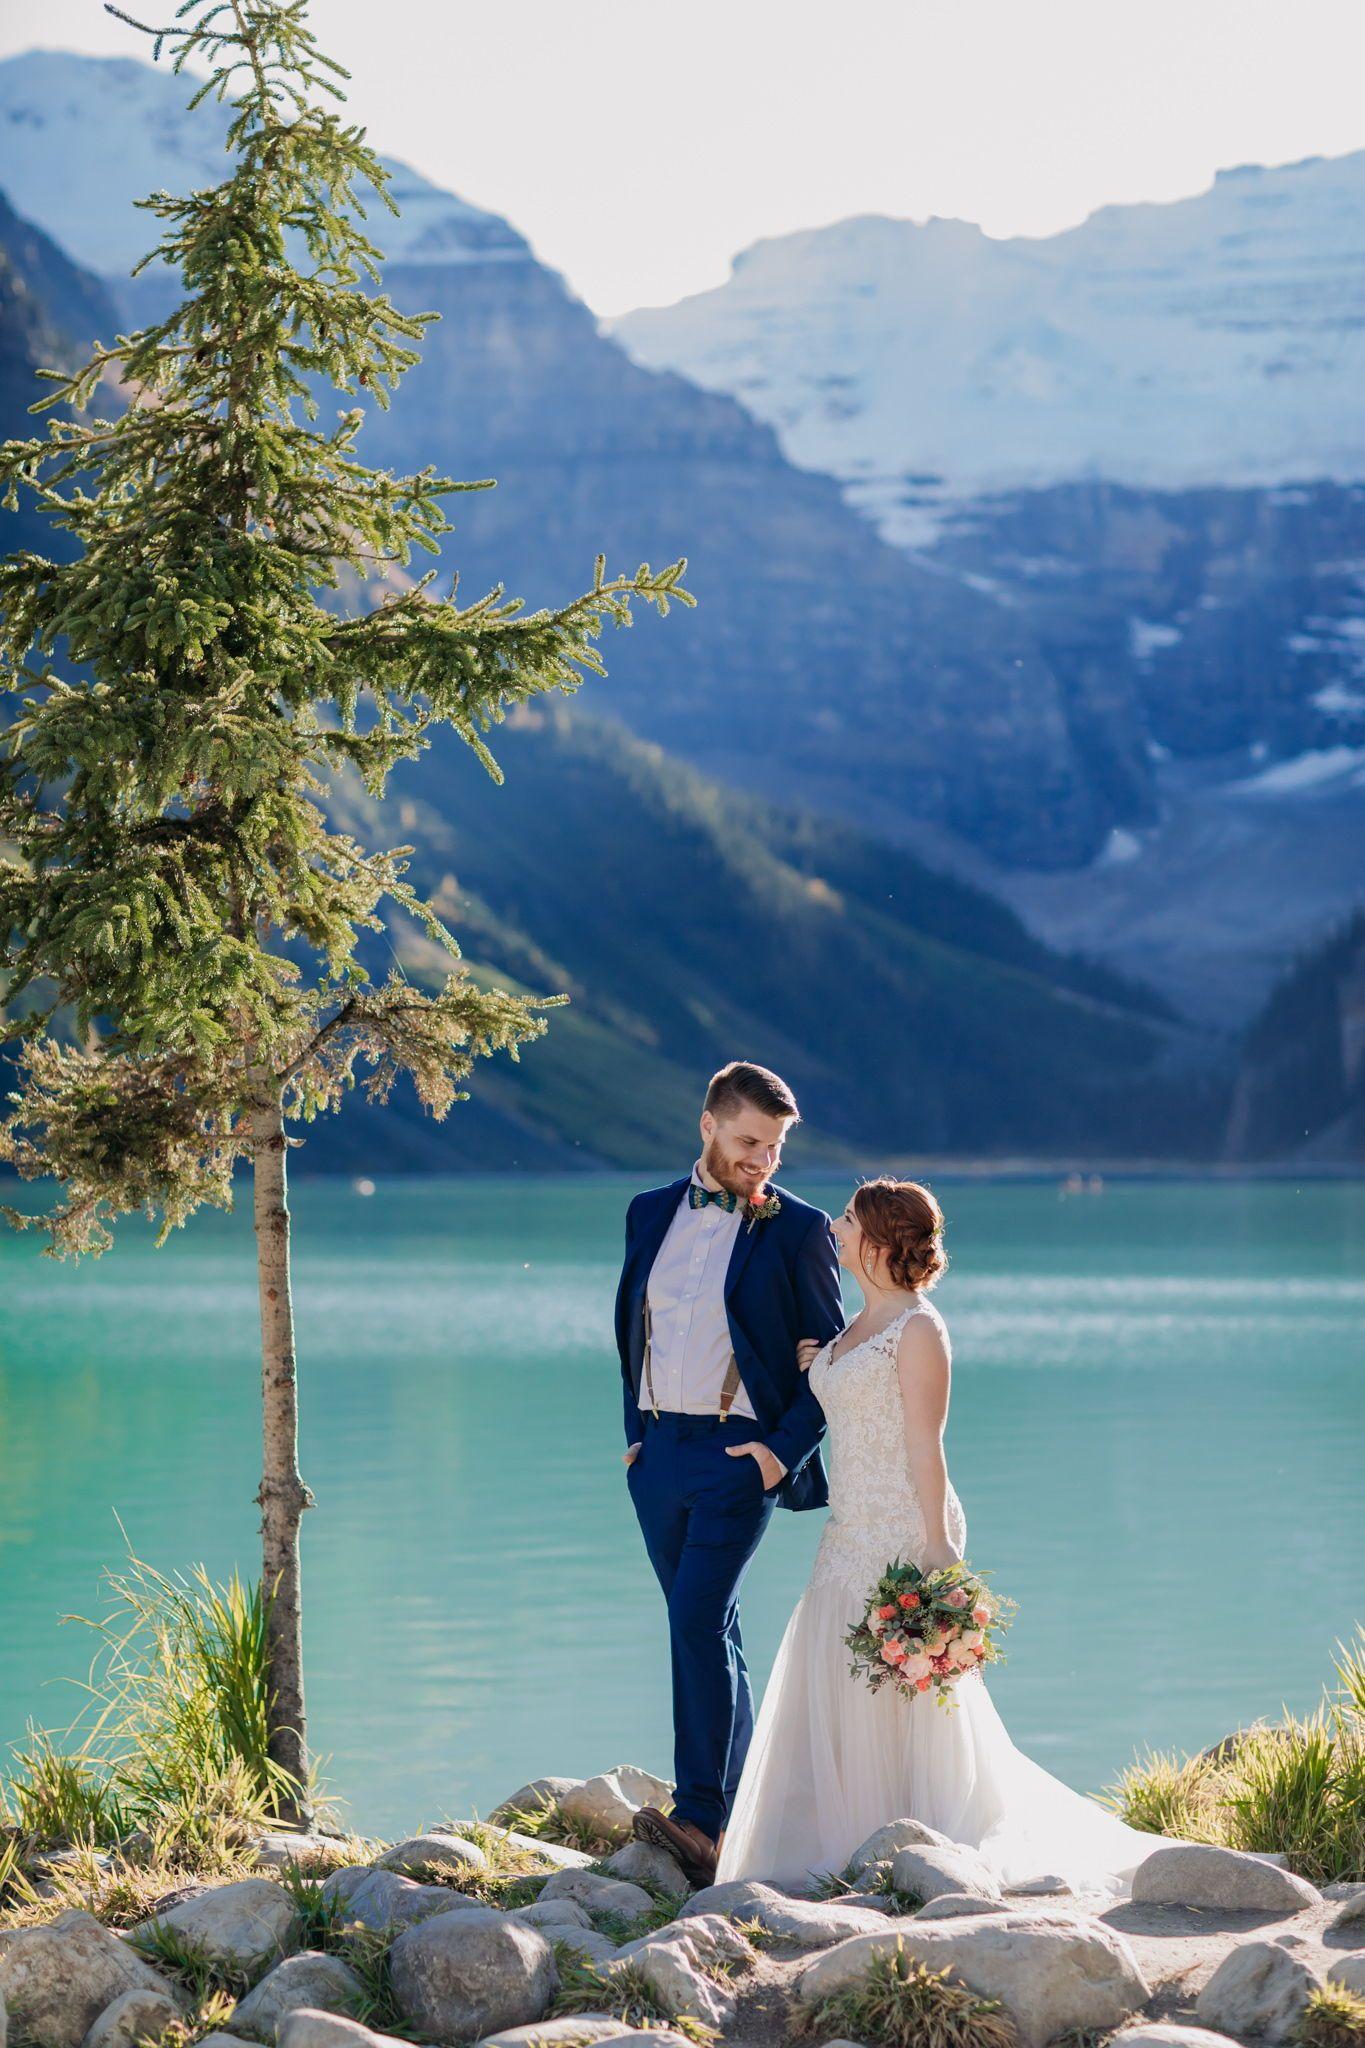 Pin on Lake Louise Weddings, Elopements & Engagements